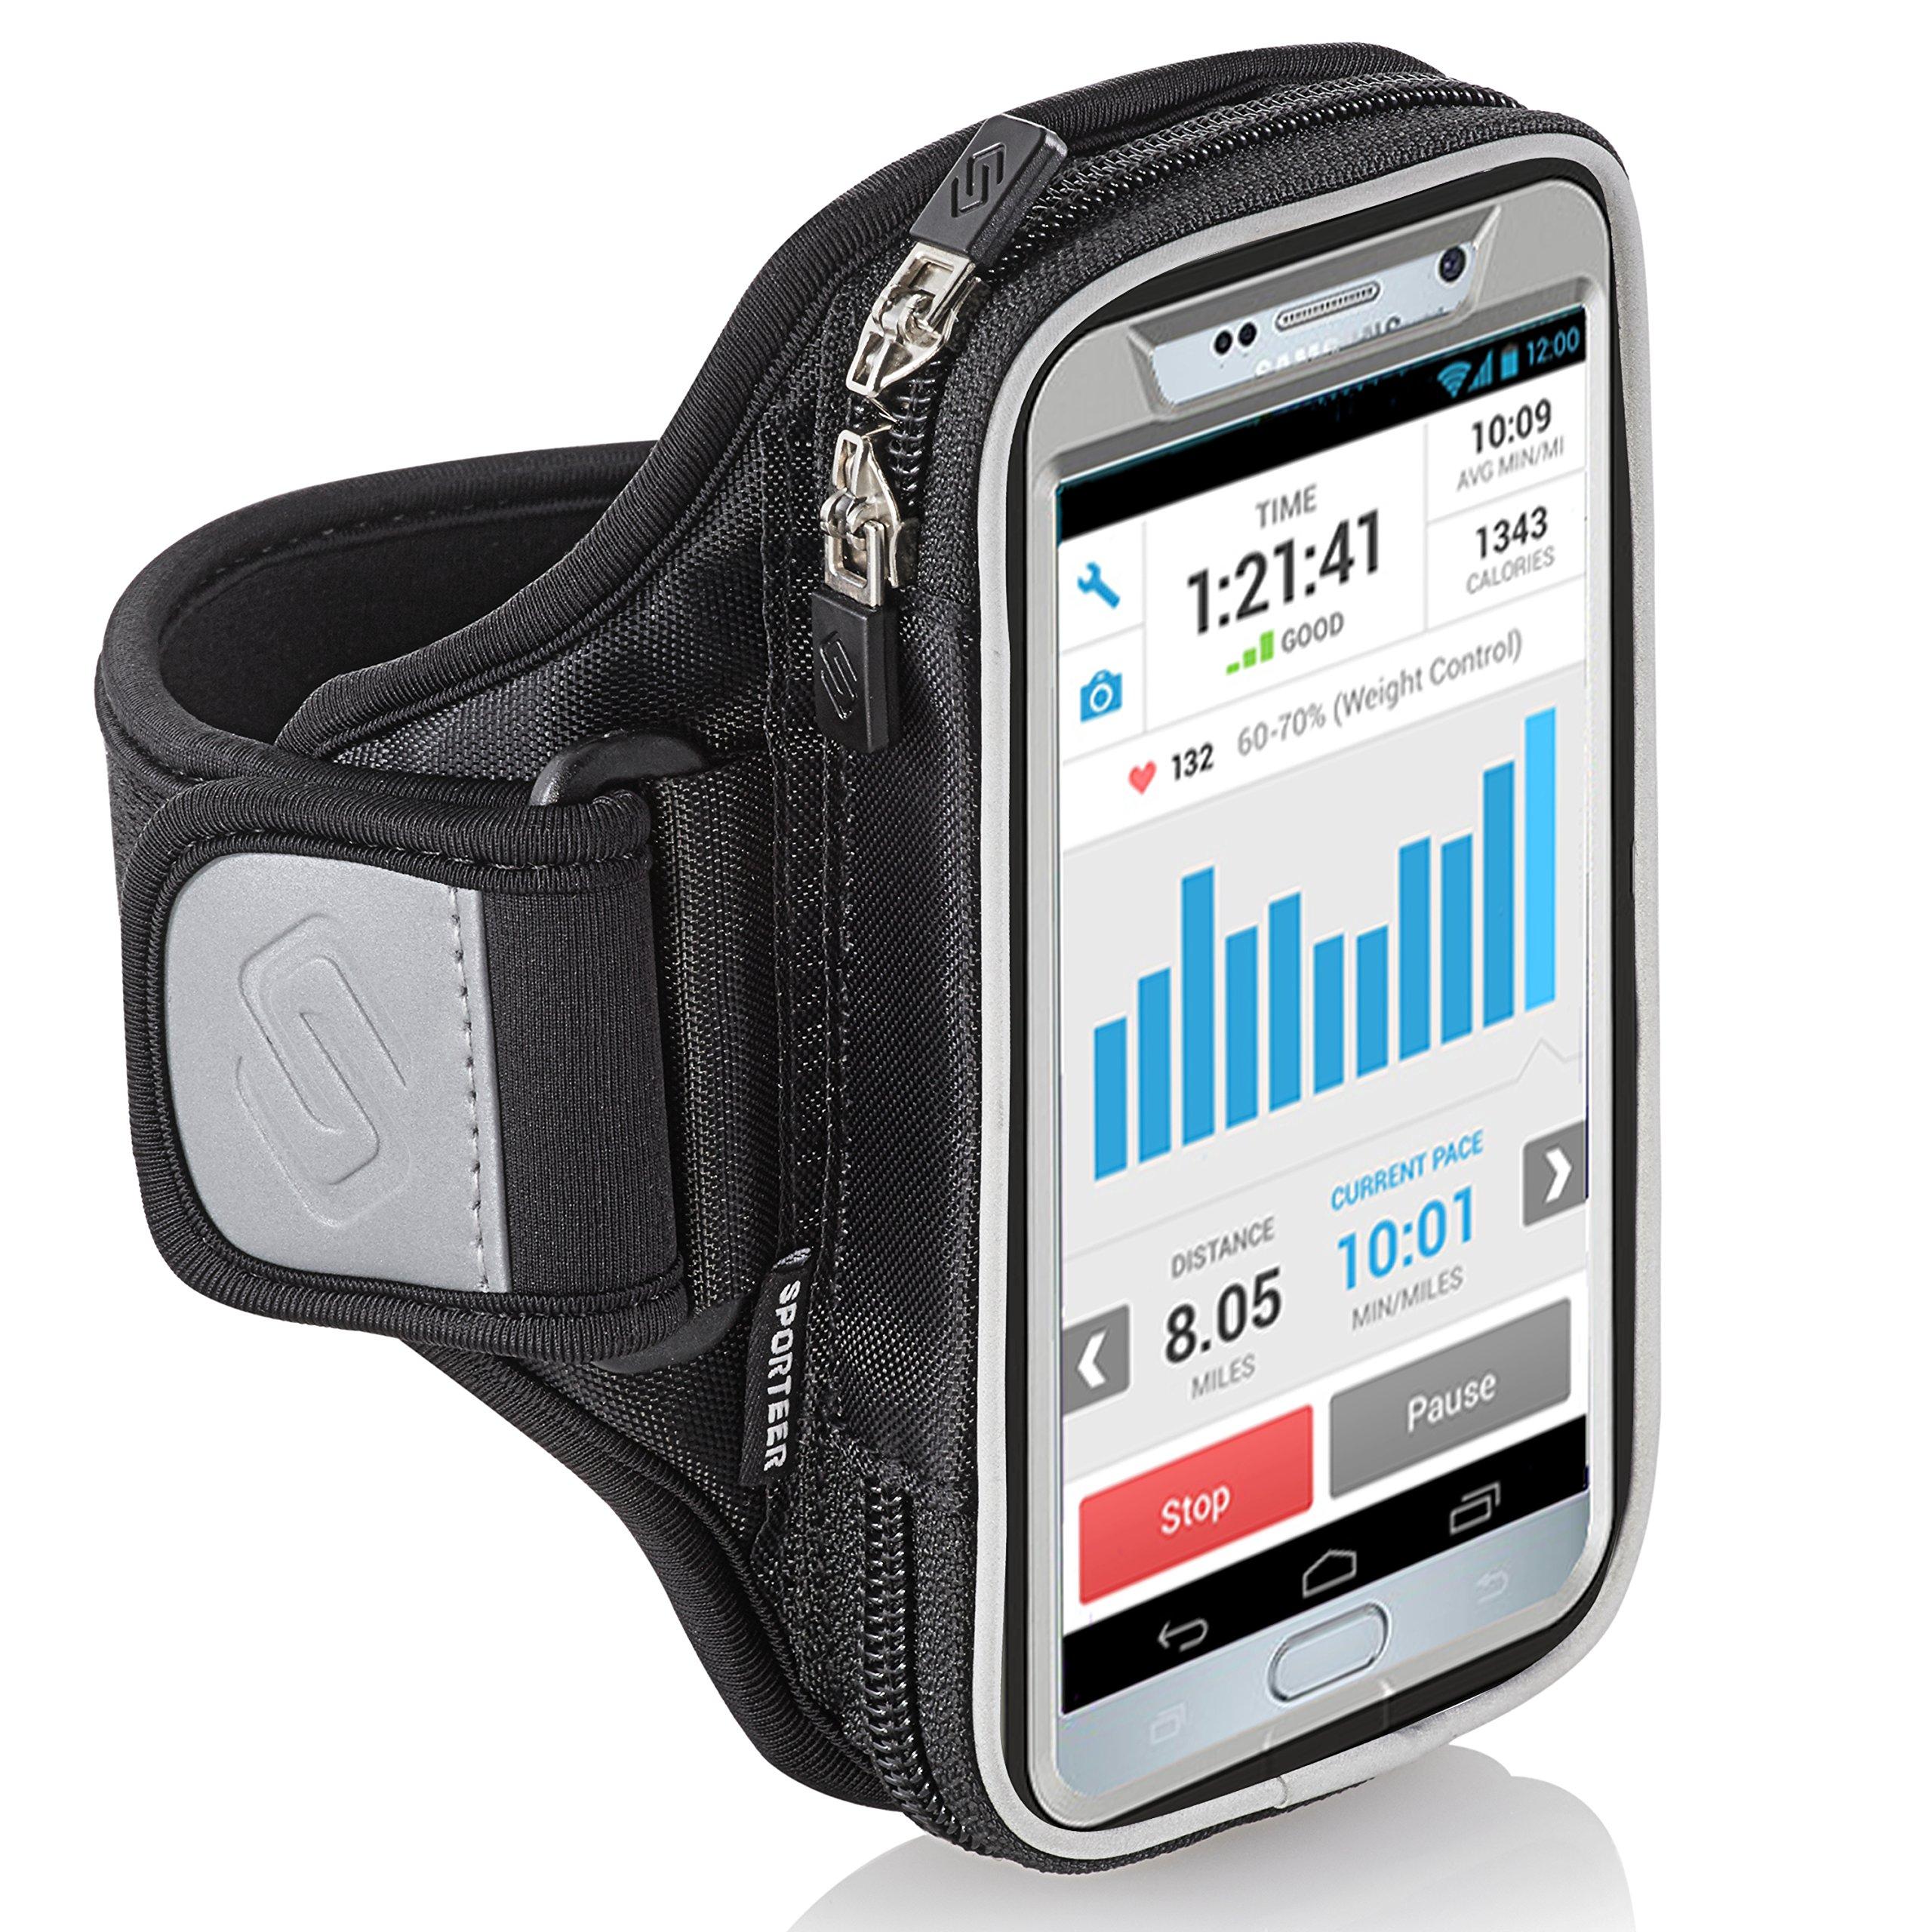 Sporteer Entropy E8 Modular Armband for iPhone 8 Plus, 7 Plus, Galaxy Note 8, Galaxy S8, S8 Plus, Pixel XL, LG G6, LG V30, Moto X4, G5S Plus, Nexus 6P, Xperia XZ, and Other Phones/Cases (M/L Straps)